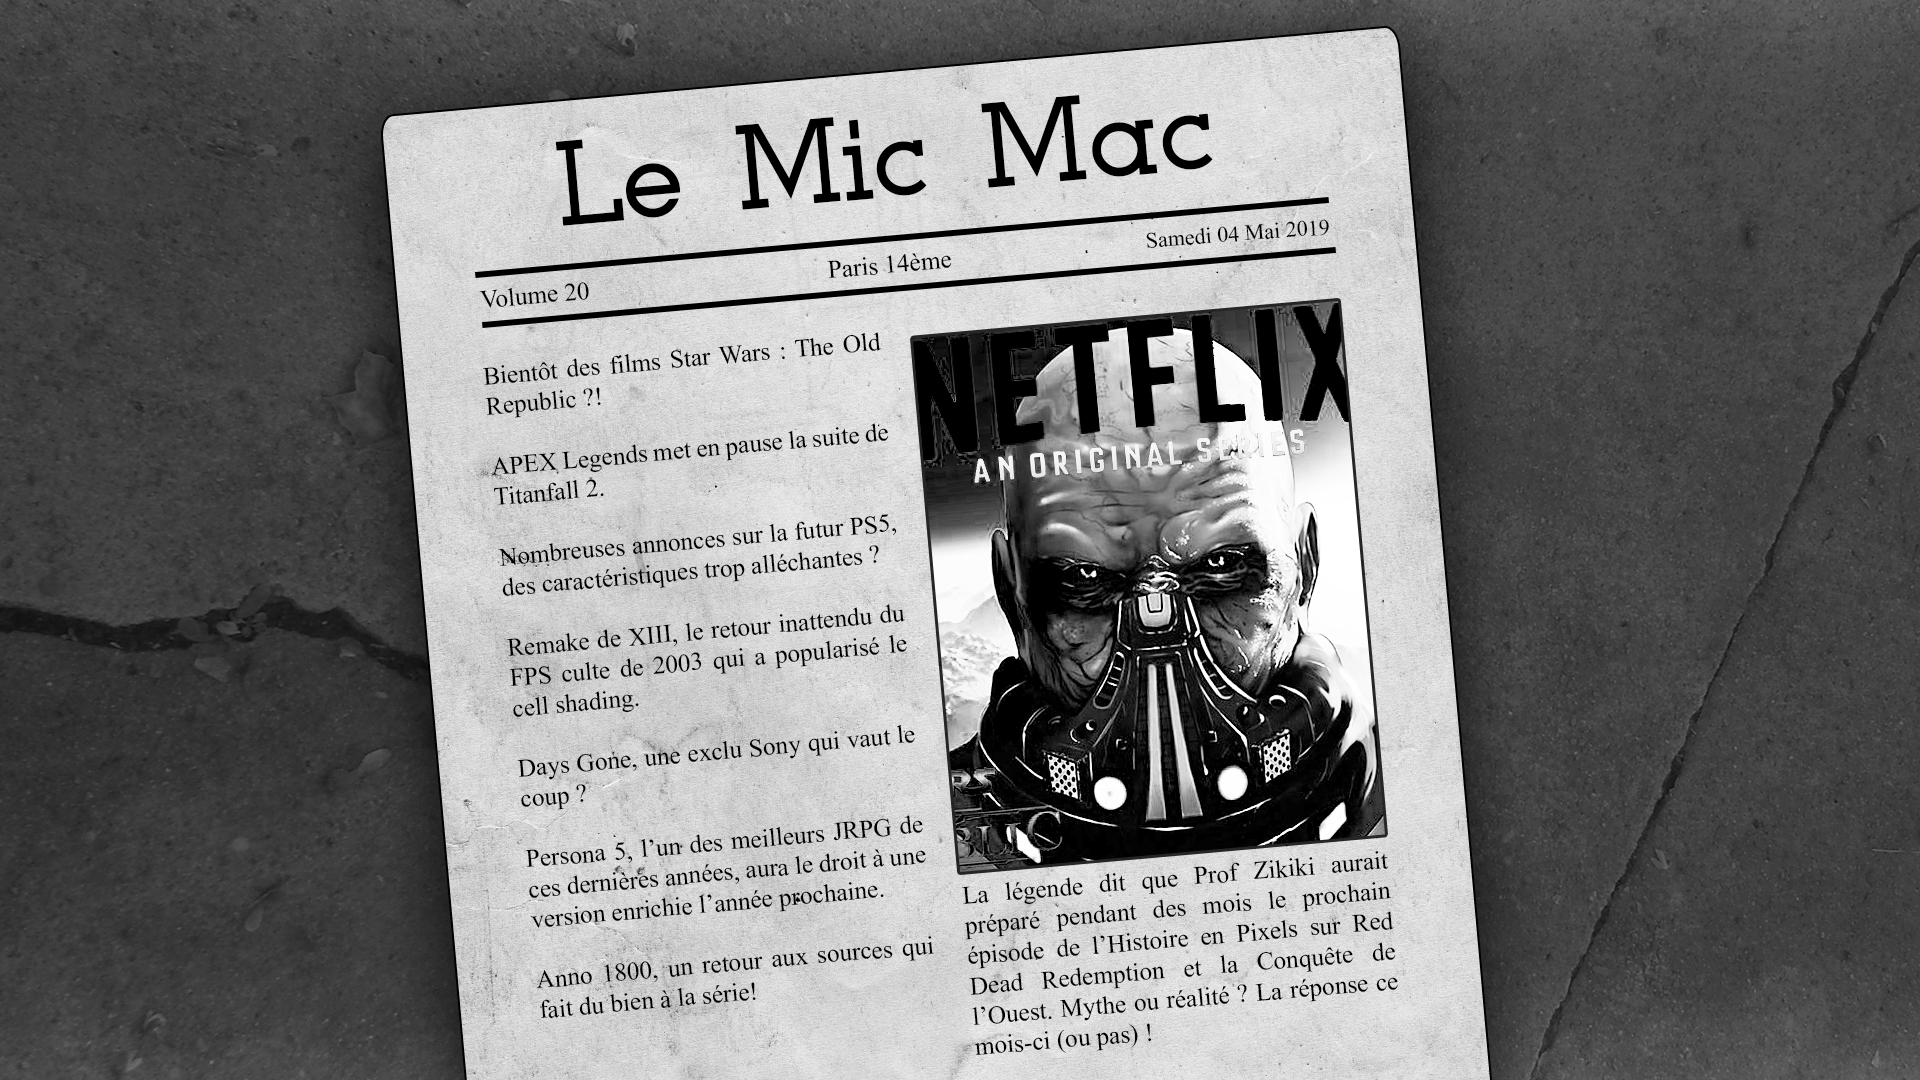 Au Tour du Mic – Mic Mac #20: 14/04/2019 au 29/04/2019